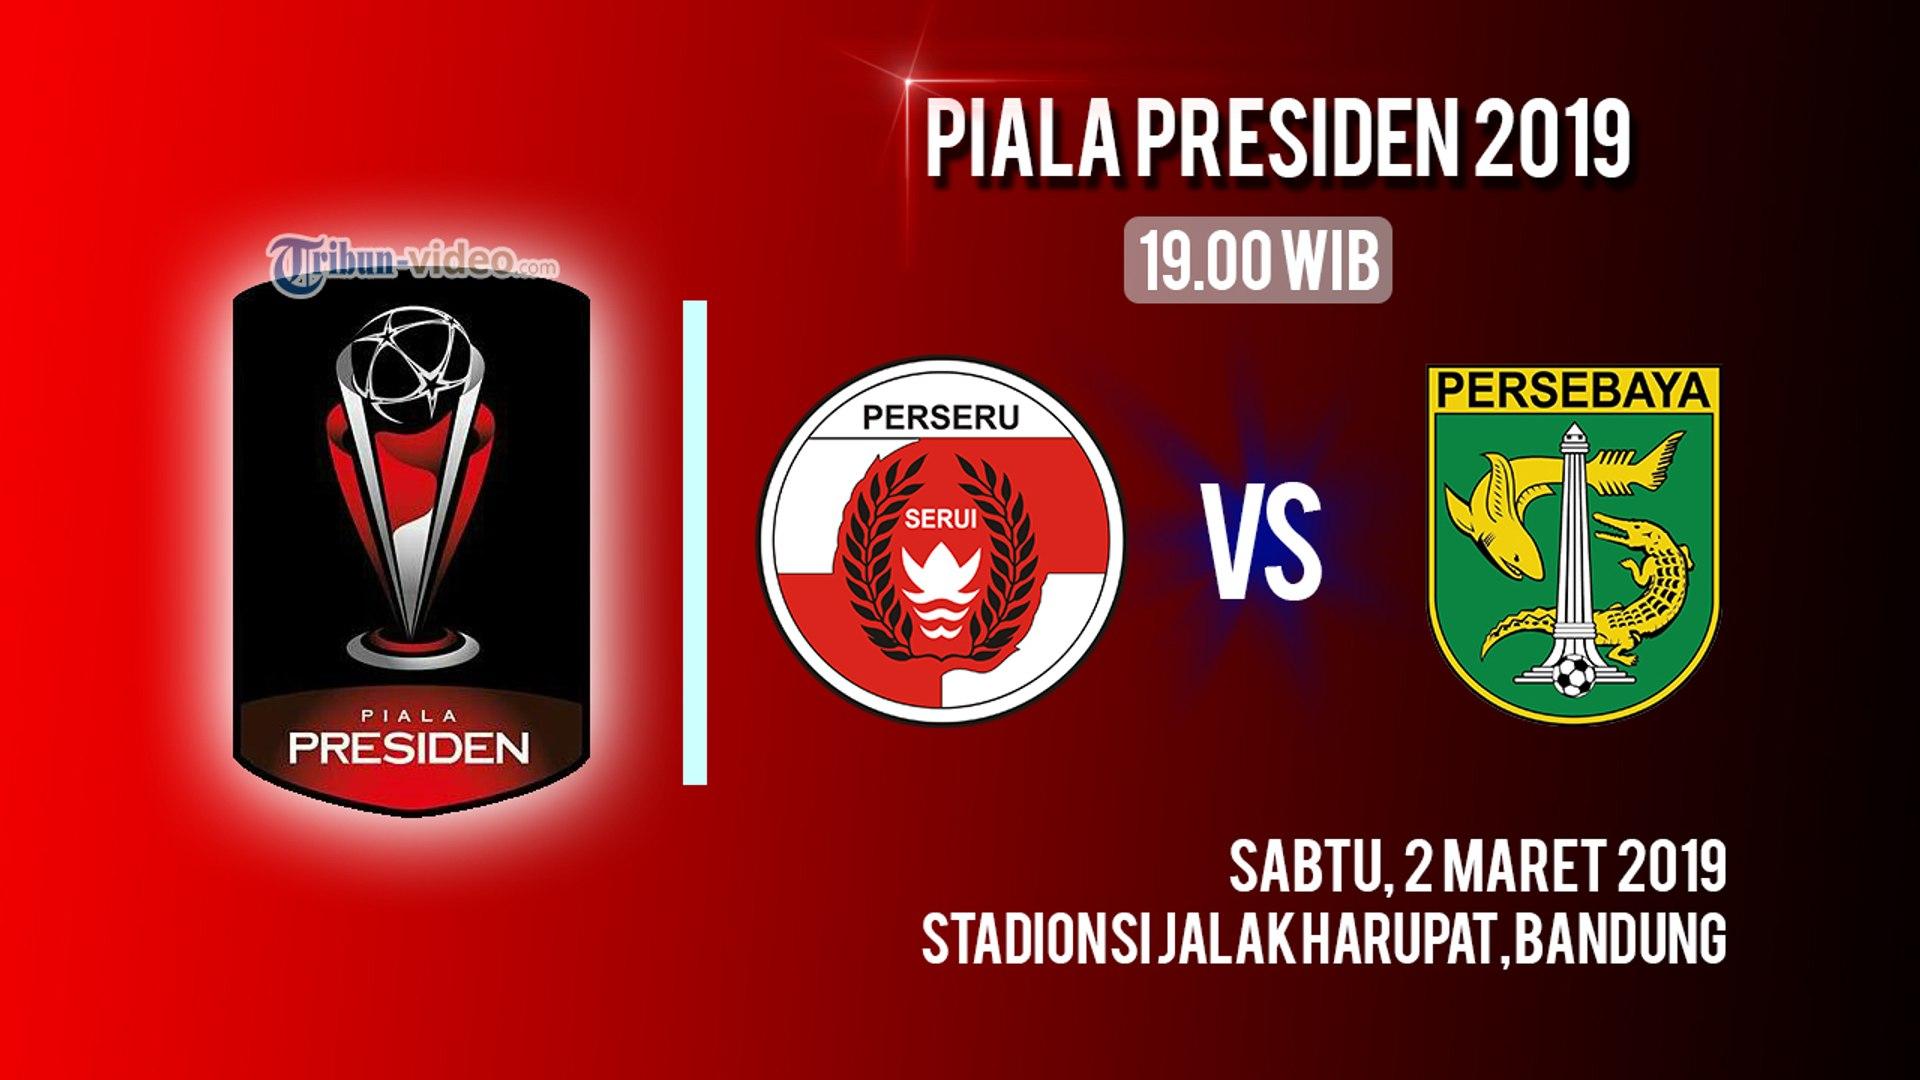 Jadwal Laga Piala Presiden 2019 Perseru Serui Vs Persebaya Surabaya, Sabtu Pukul 19.00 WIB